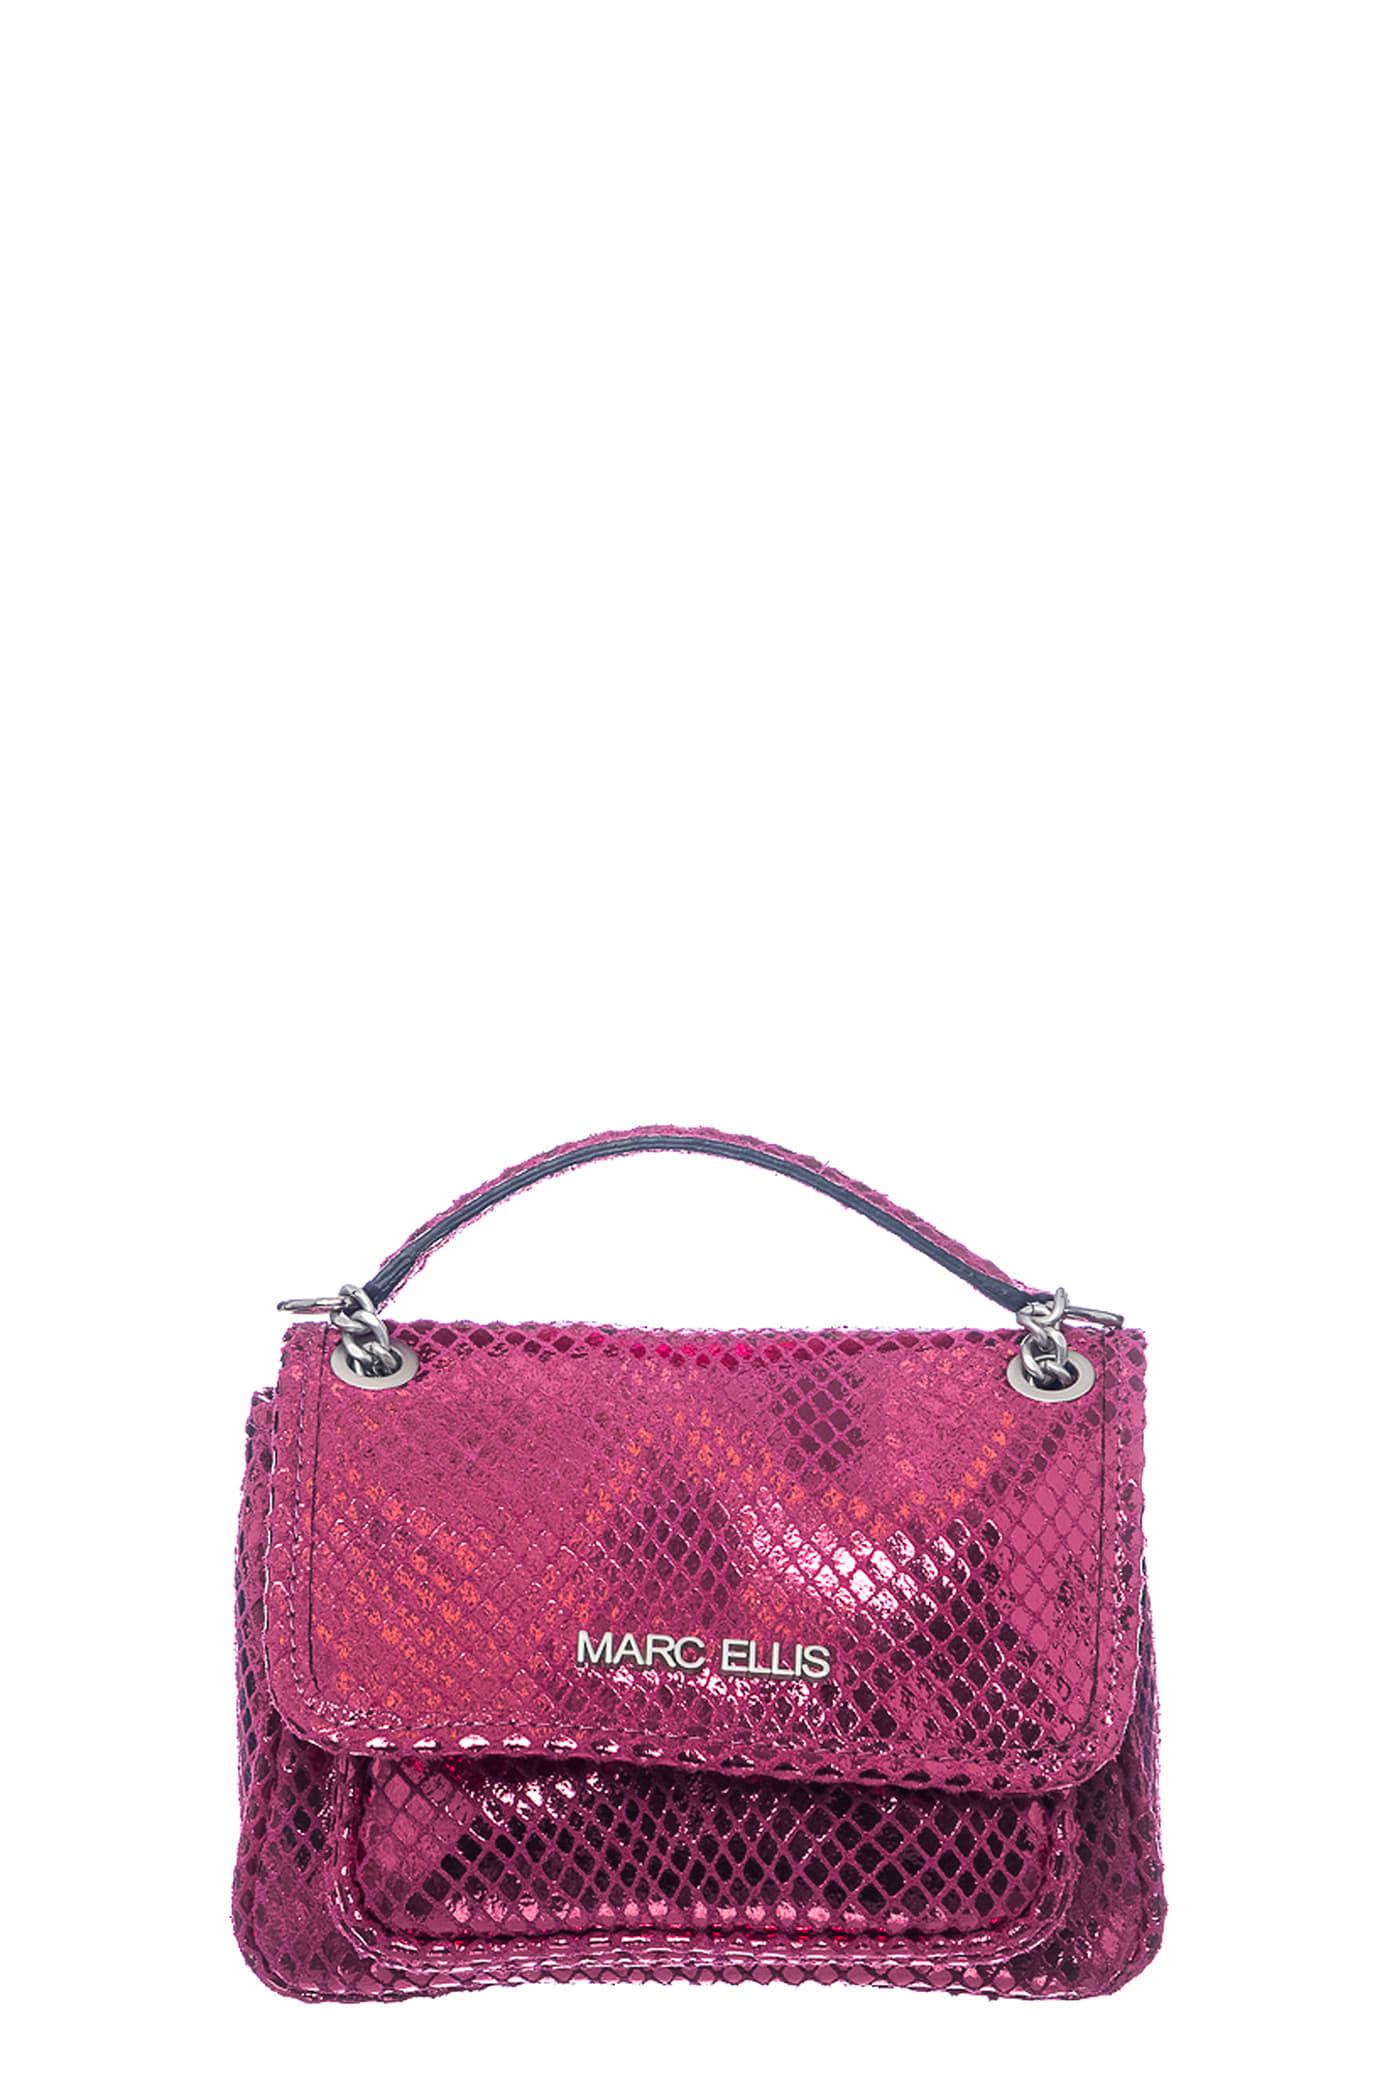 Rhonda S Shoulder Bag In Fuxia Leather